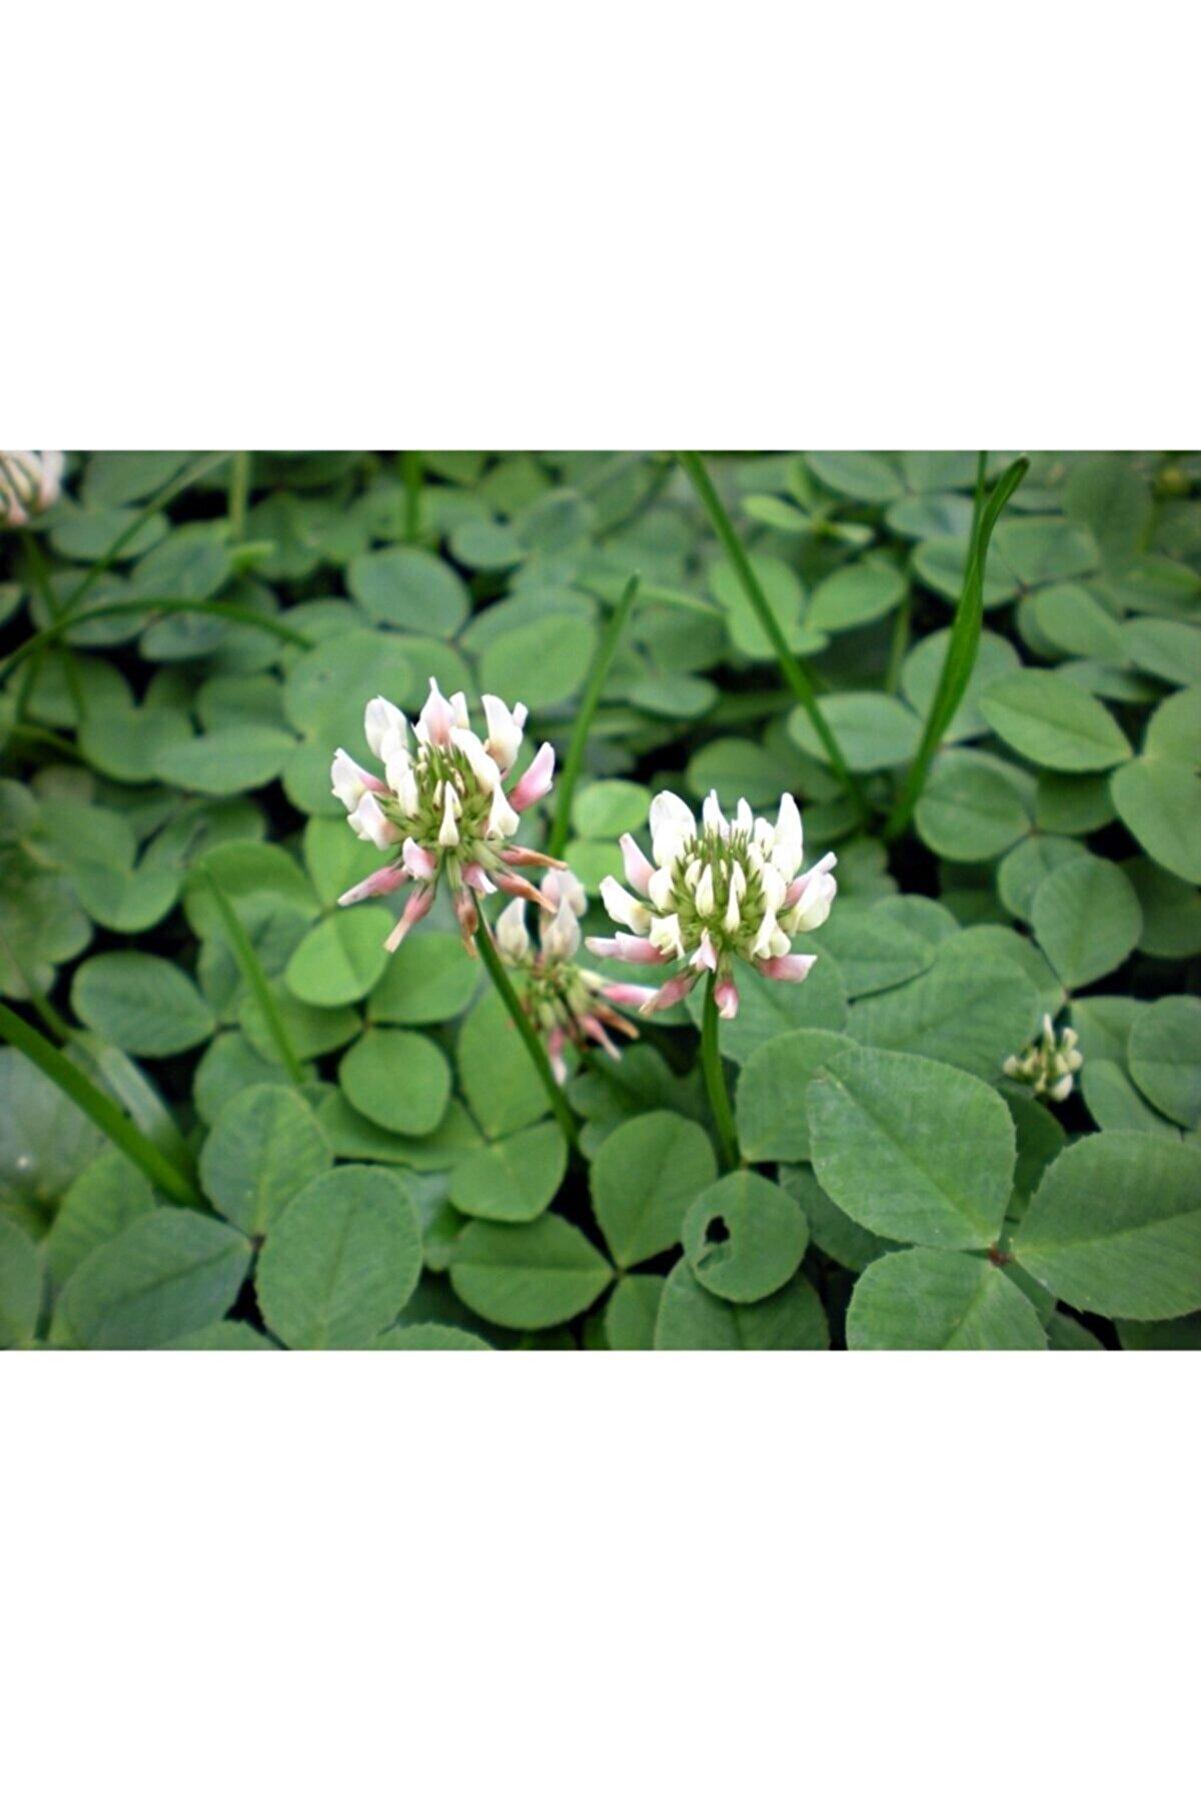 Doğalsan Tarım Ak Üçgül Tohumu 100 Gr Trifolium Repens Süs Yoncası Tohumu Bodur Yonca Tohumu Yonca Çim Tohumu